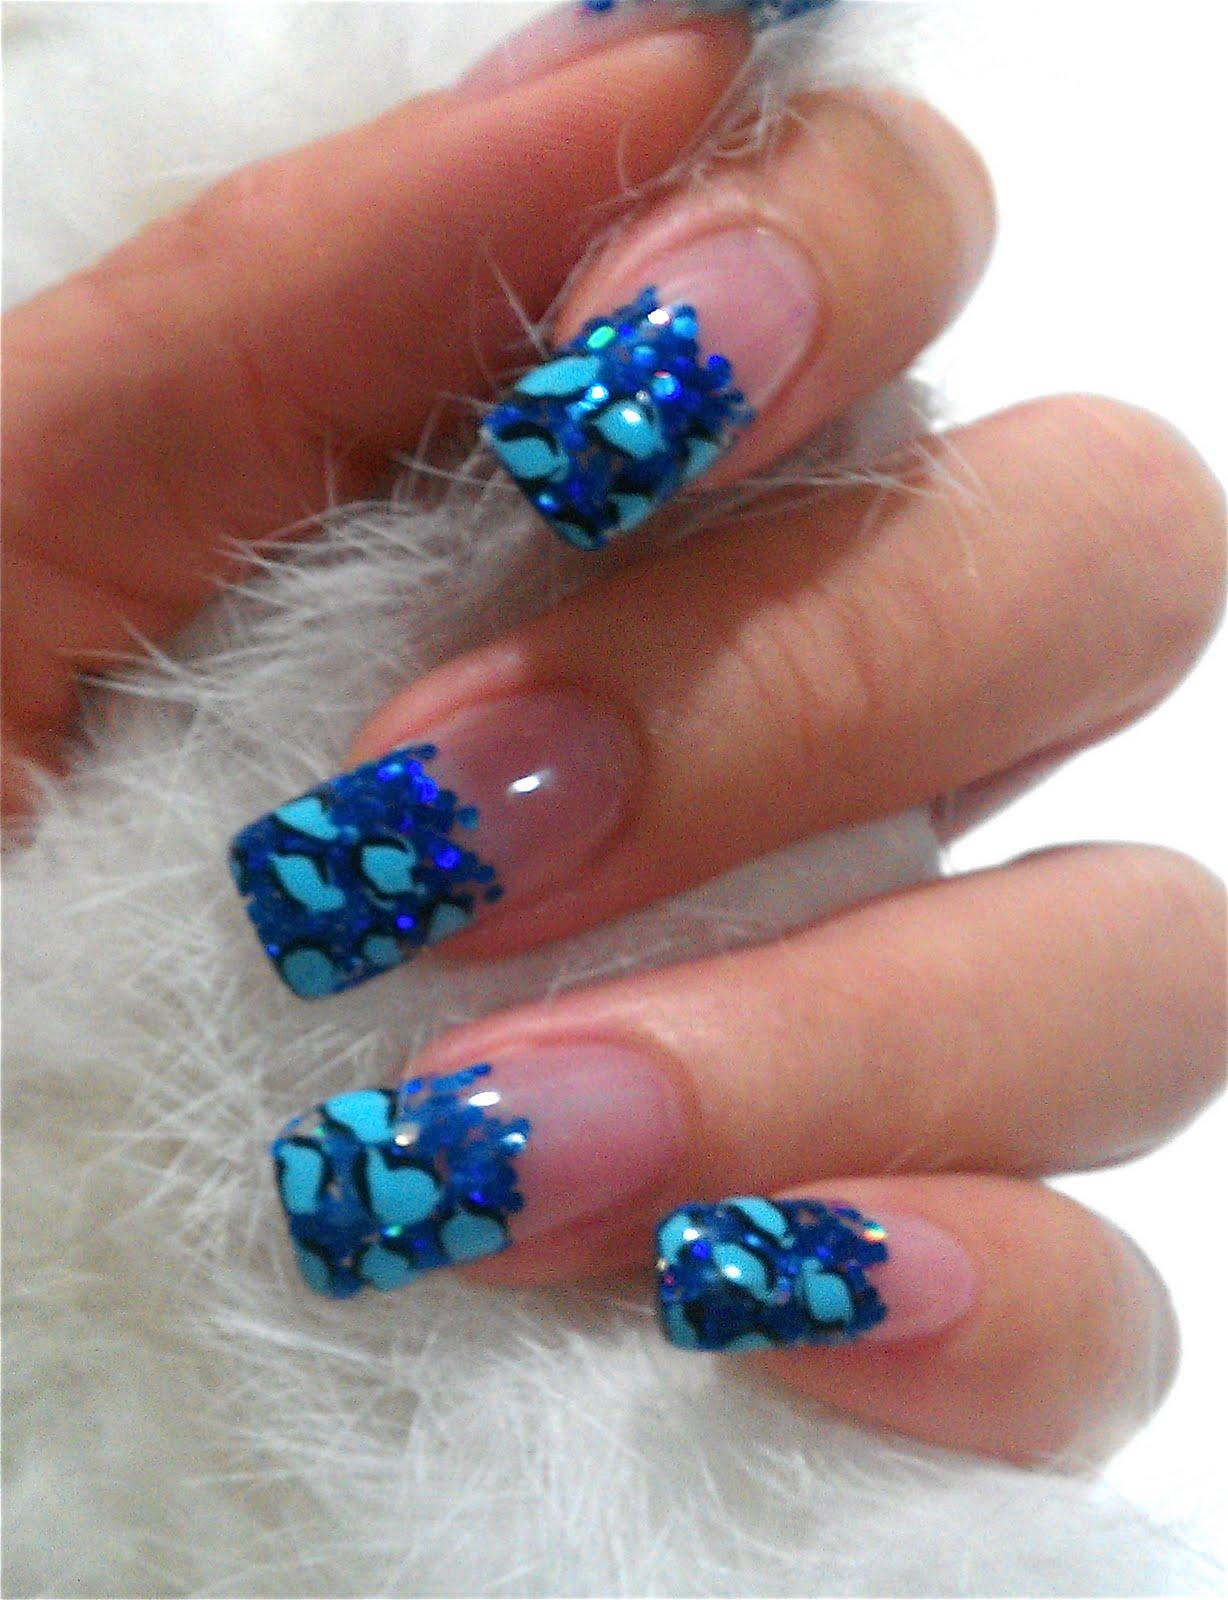 The Clover Beauty Inn: NOTD: Blue Glitter Leopard Print